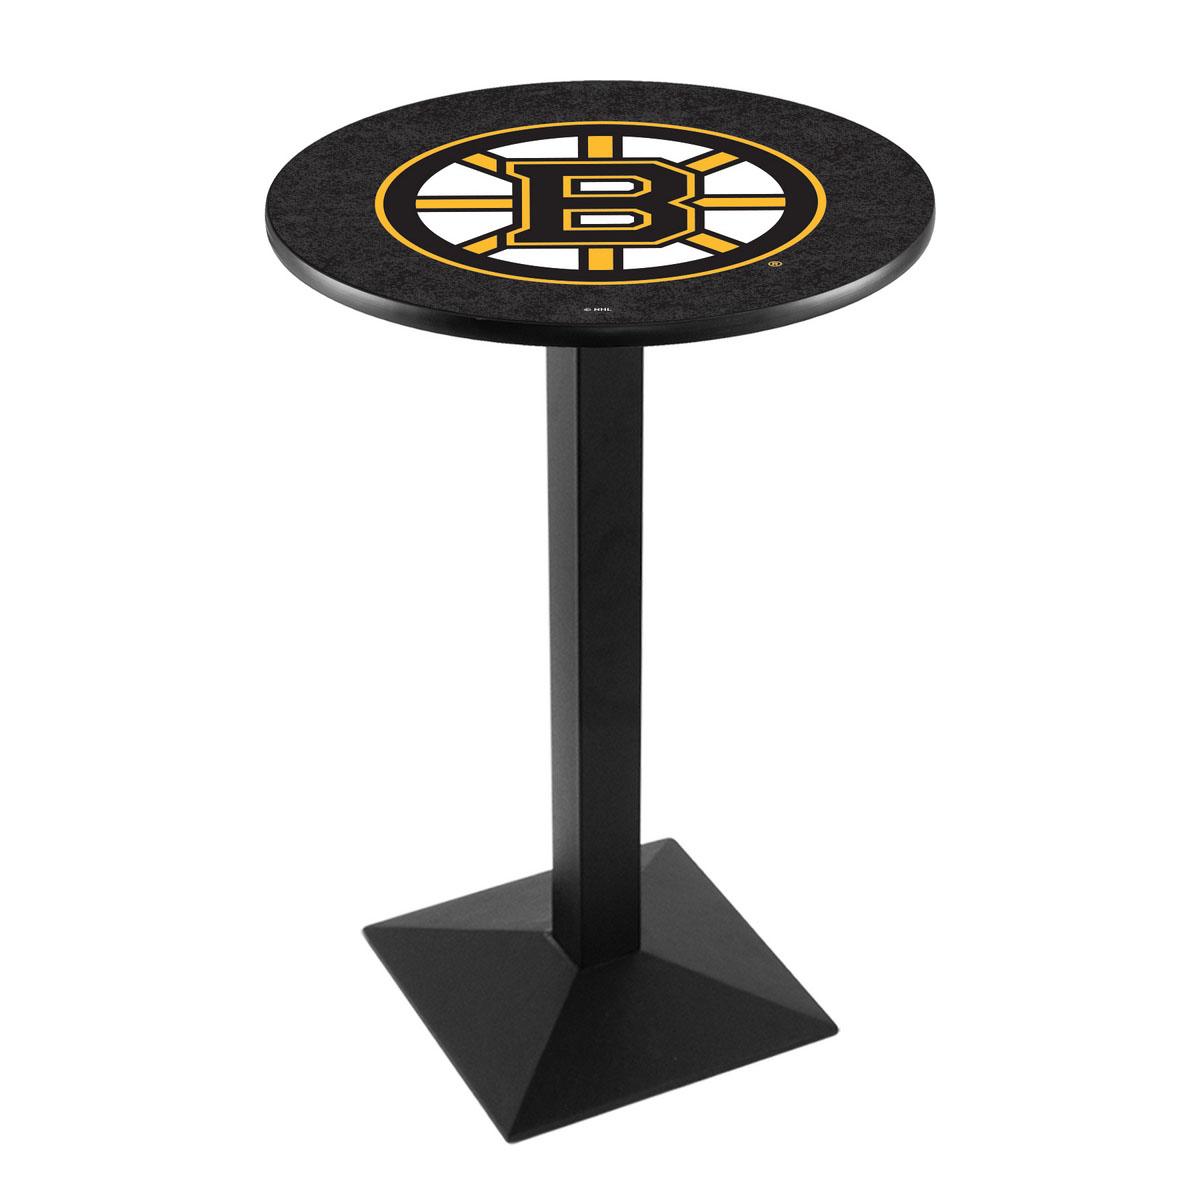 Magnificent Boston Bruins Logo Pub Bar Table Square Stand Product Photo